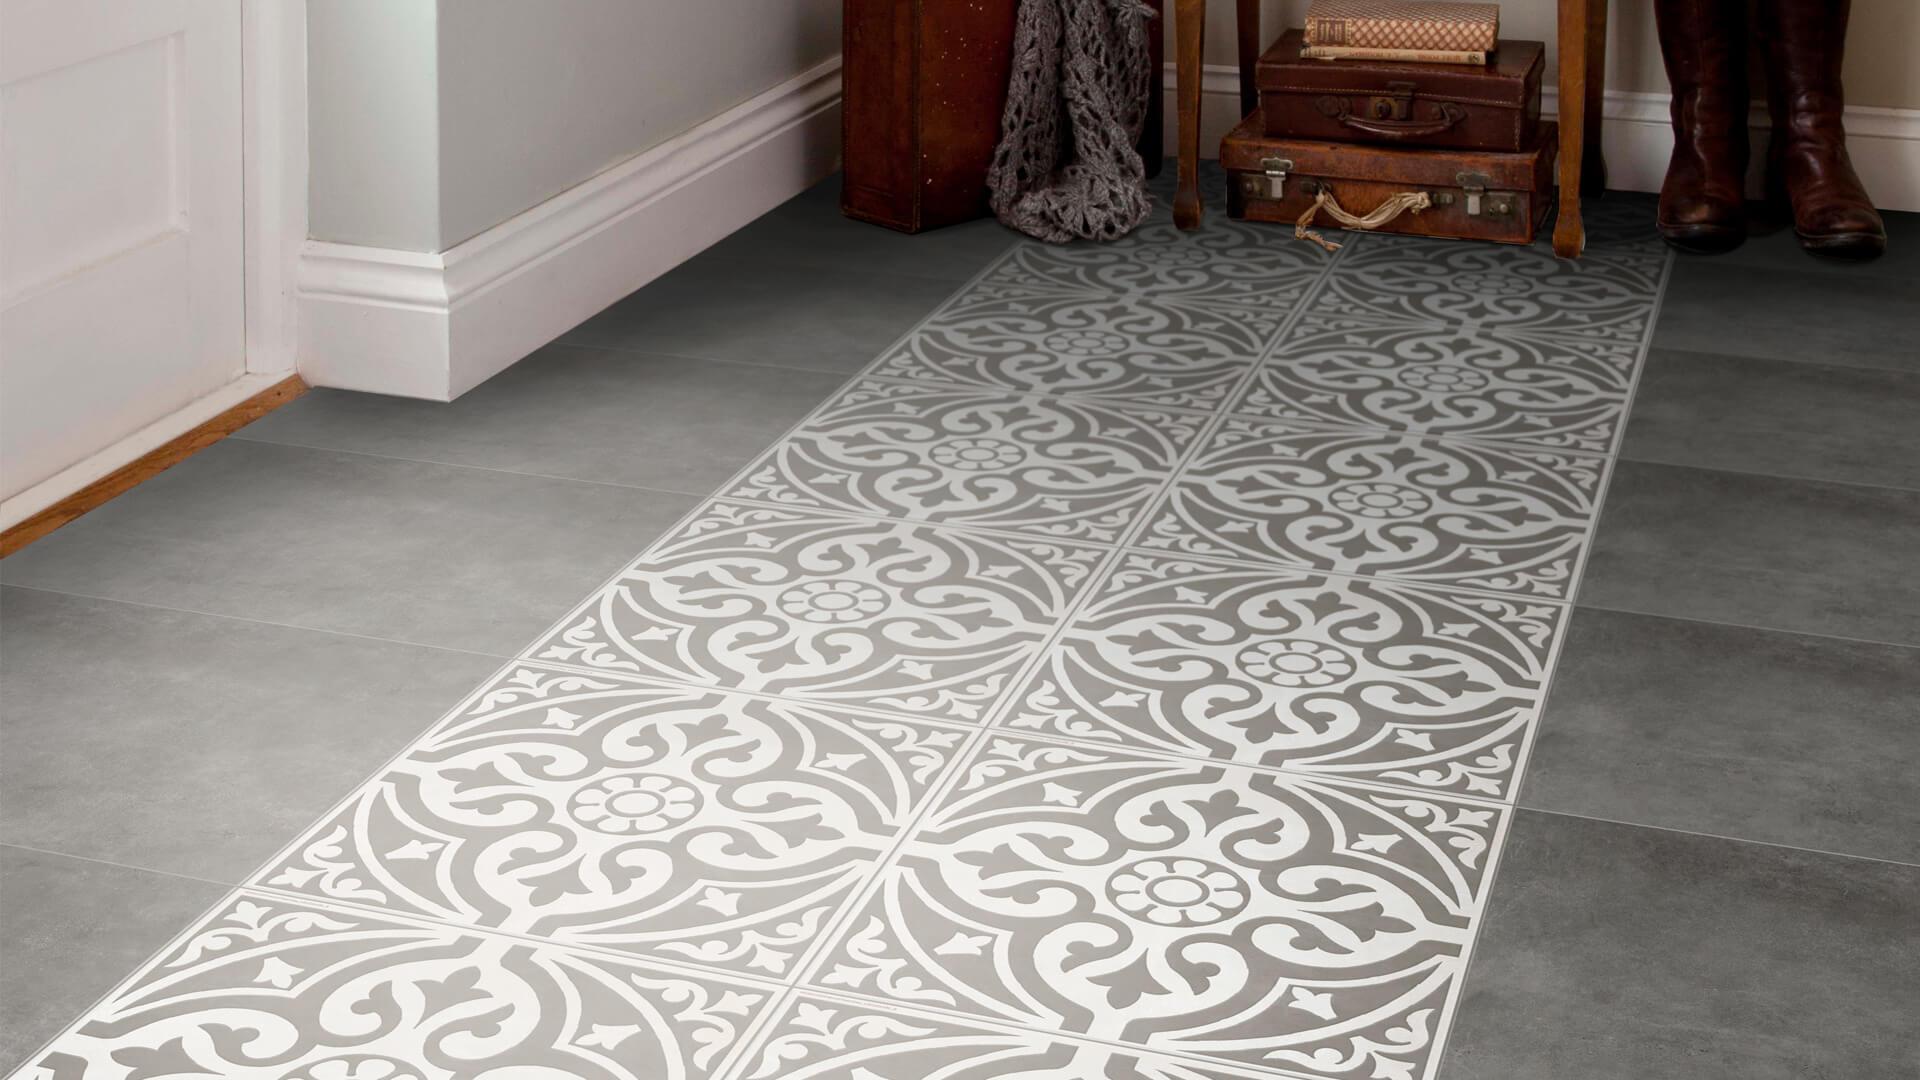 British ceramic tile buy wall floor tiles online make an entrance doublecrazyfo Images